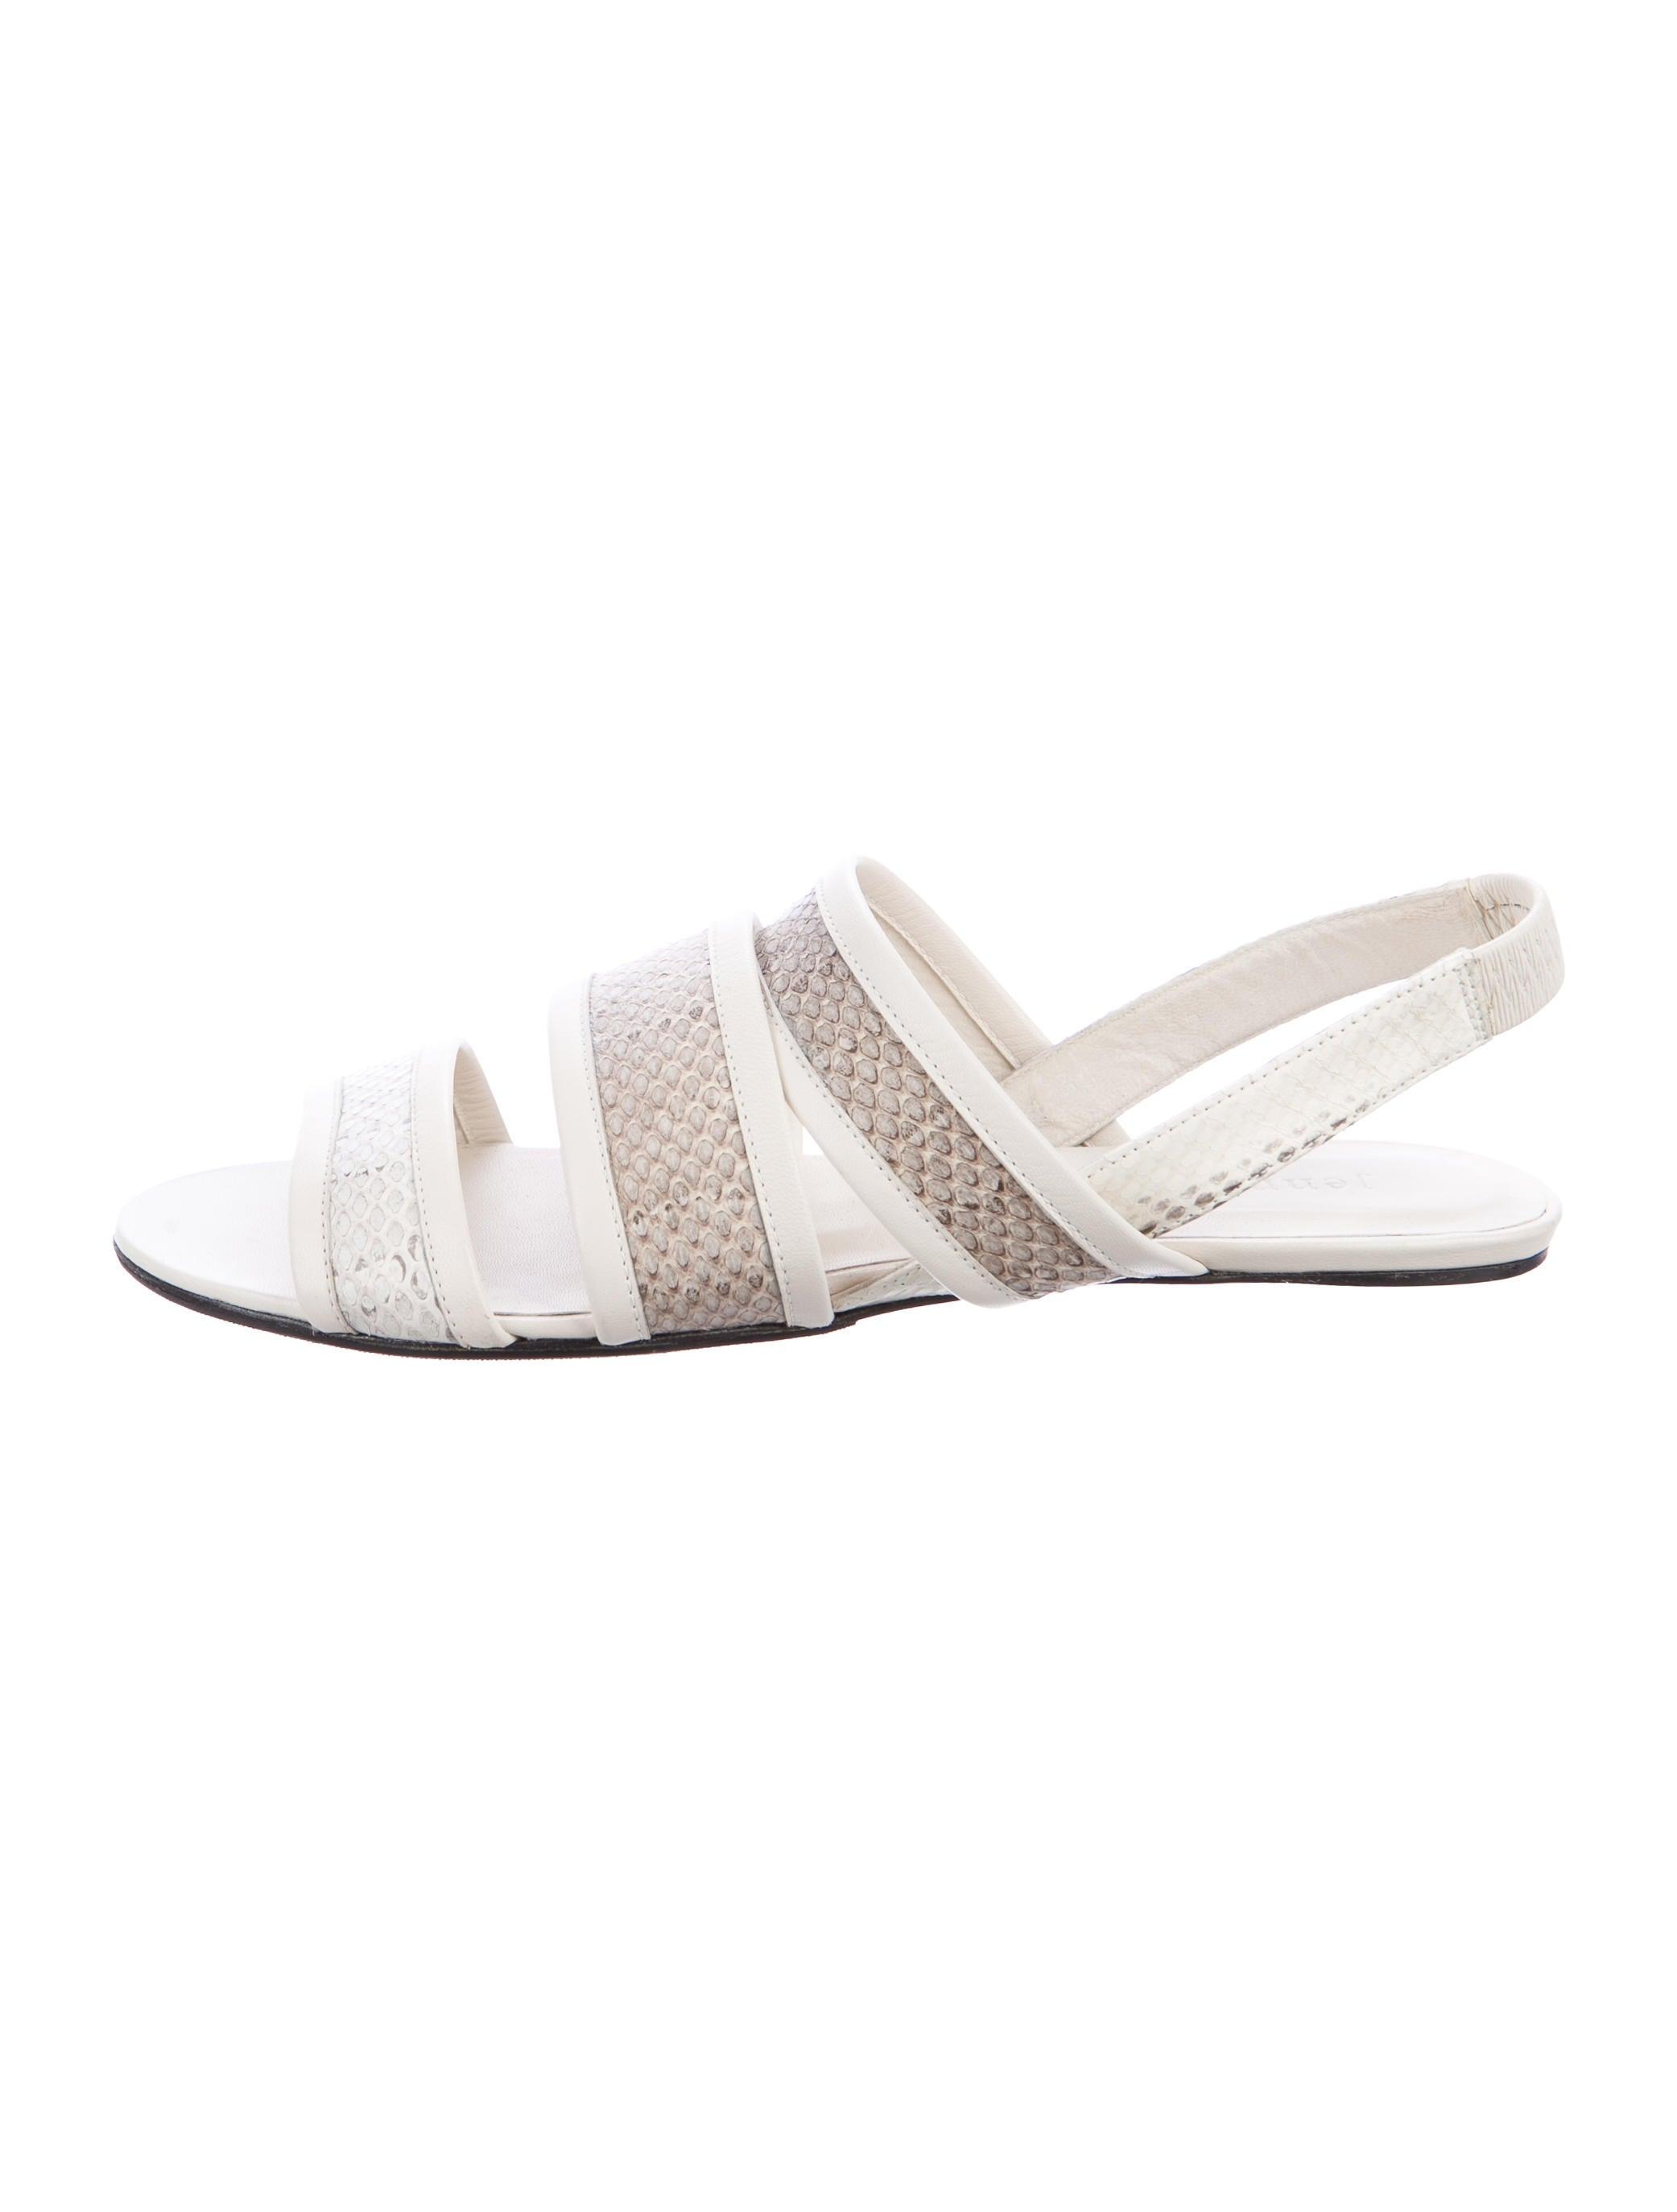 official for sale discount wholesale Jenni Kayne Snakeskin Slingback Sandals classic szd5e